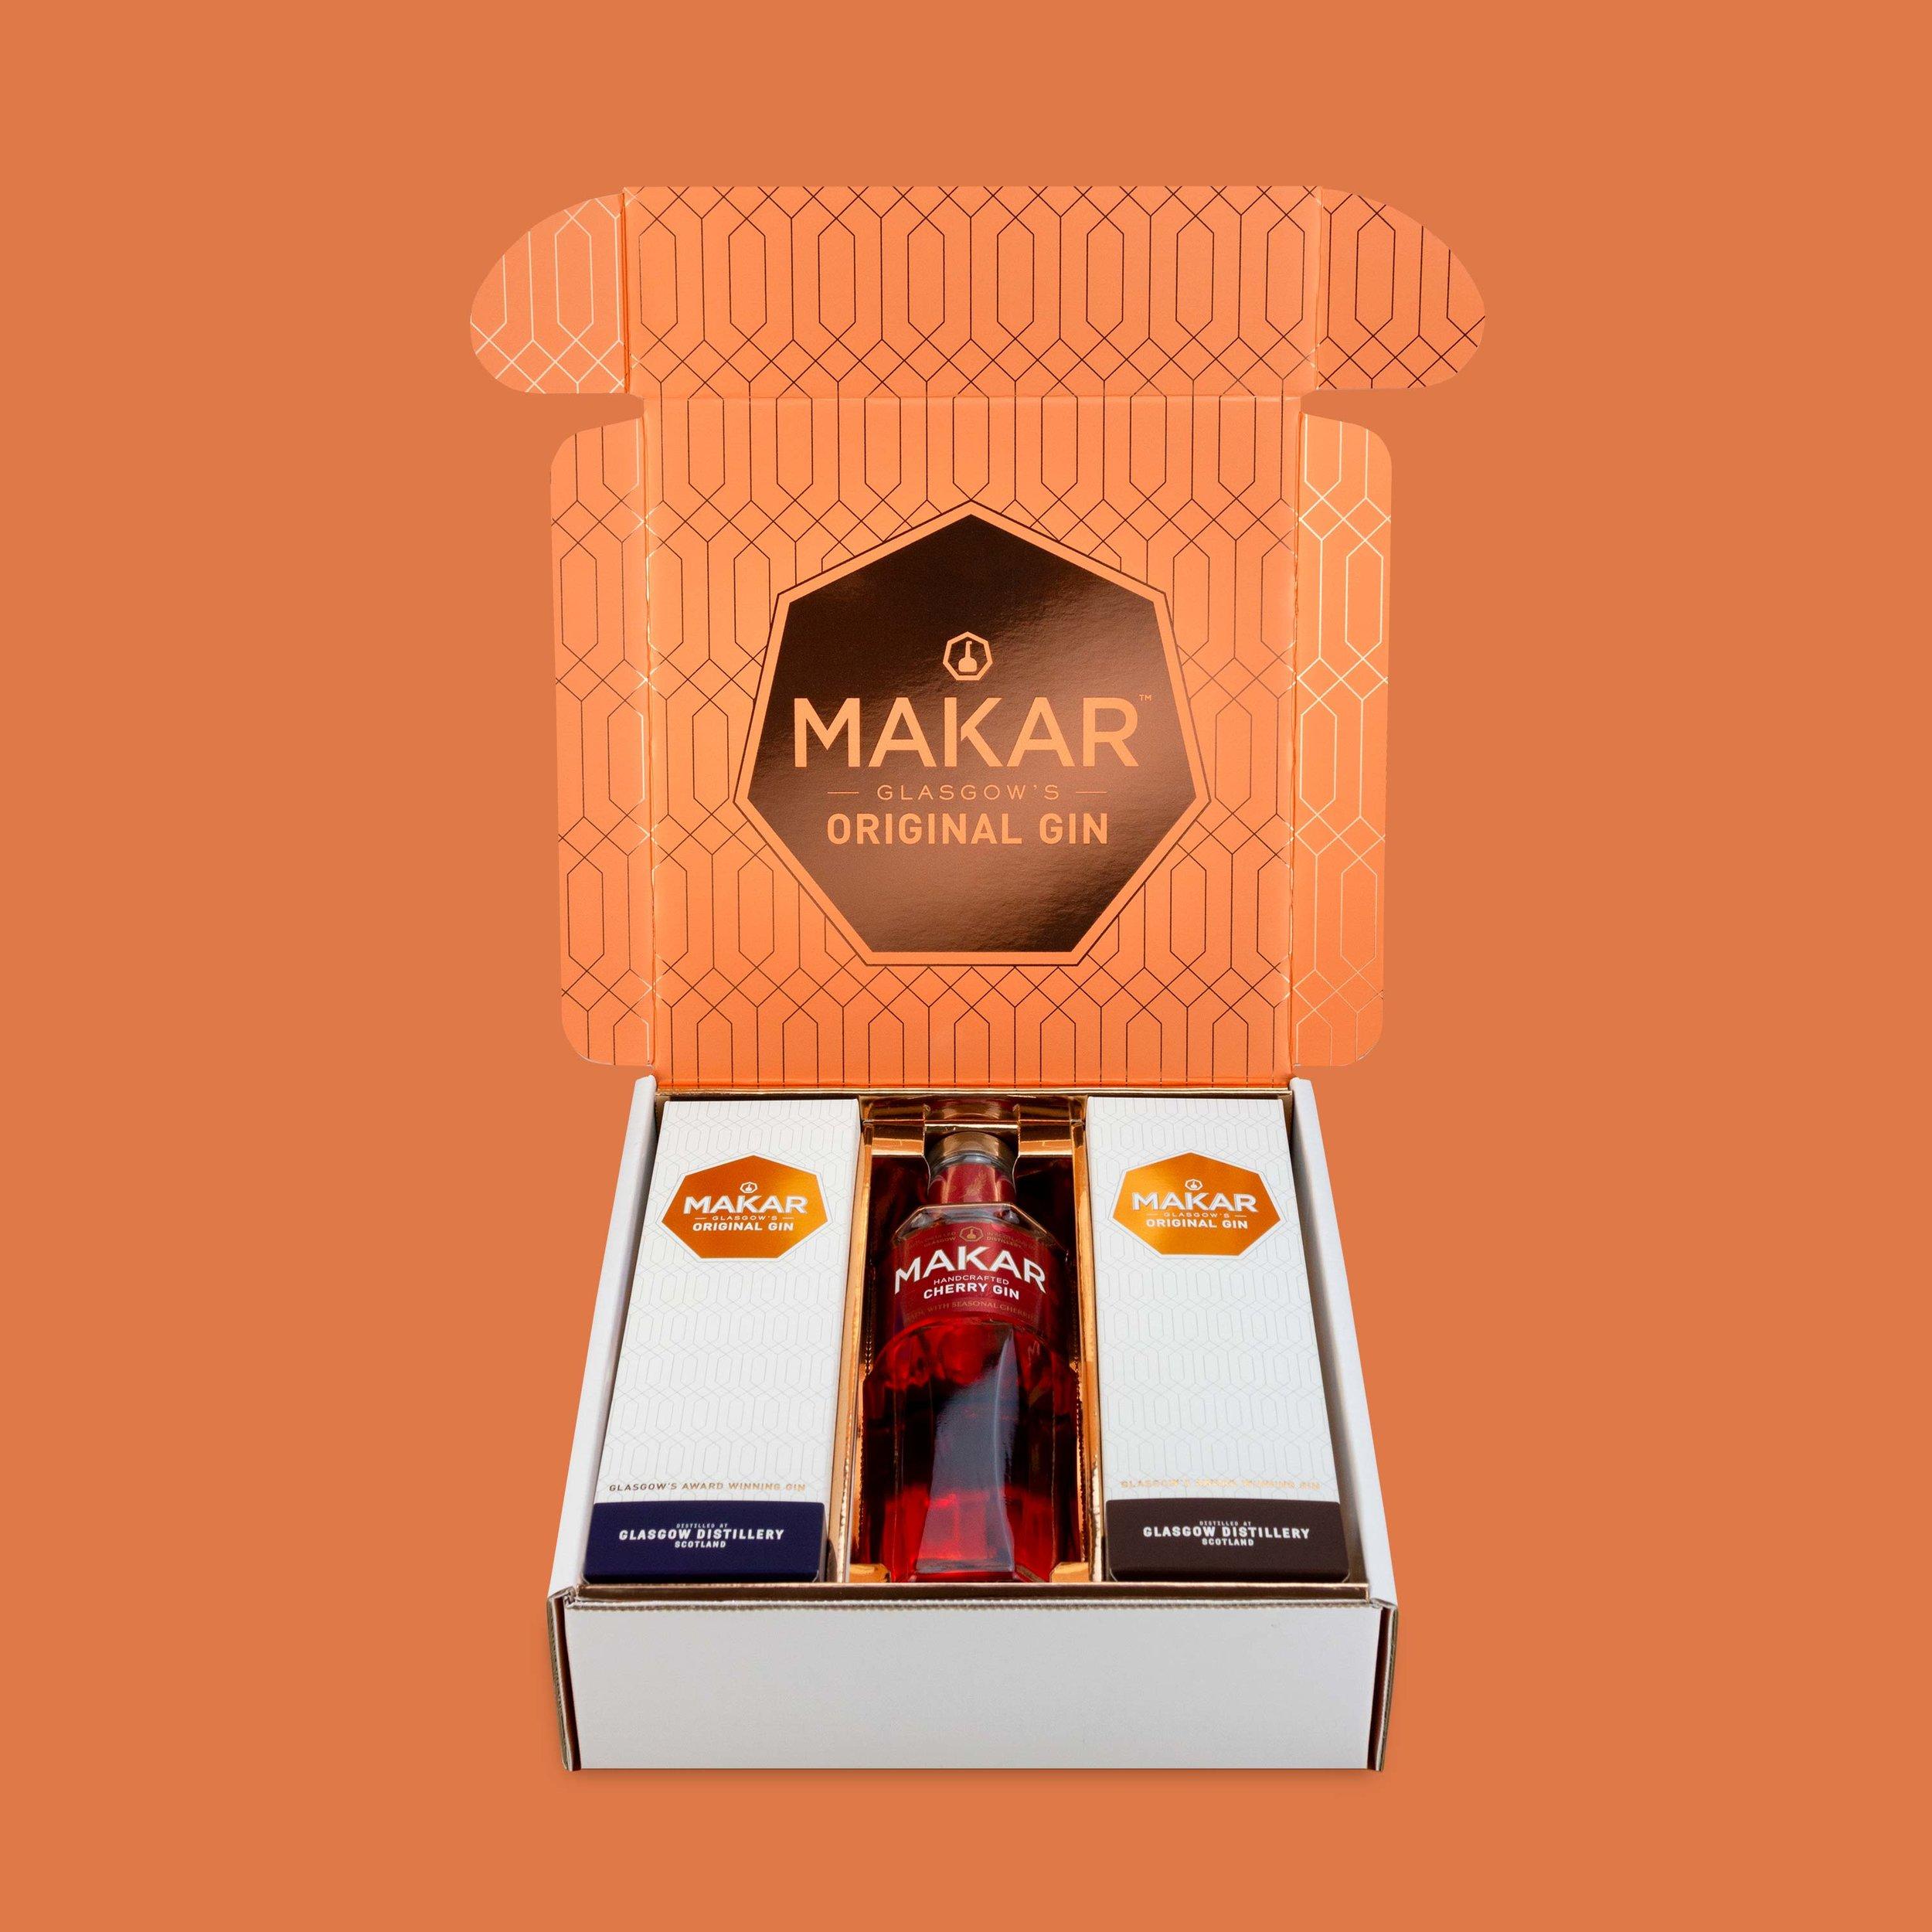 Makar-Gin-Wow-Box-Packaging-Design-Prototype-02.jpg